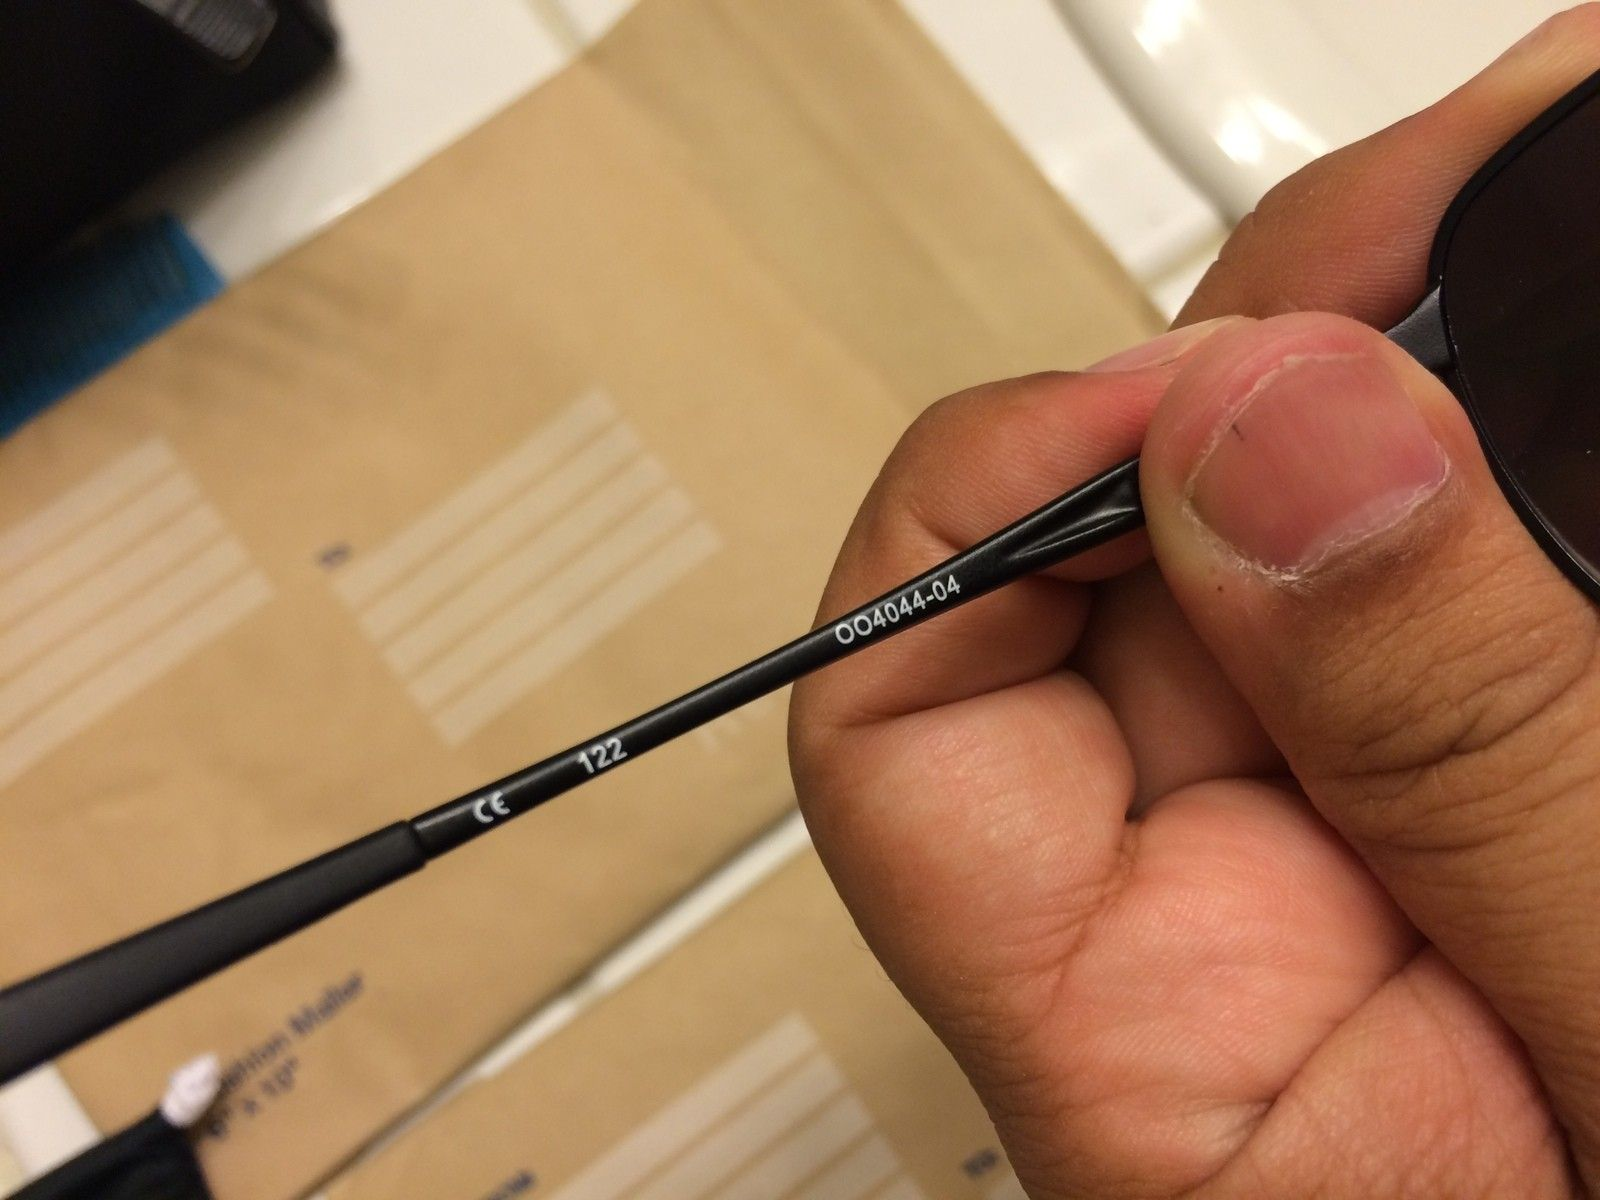 Crosshair 2.0 Black - New -Under $80 - 2015-07-01 21.17.38.jpg